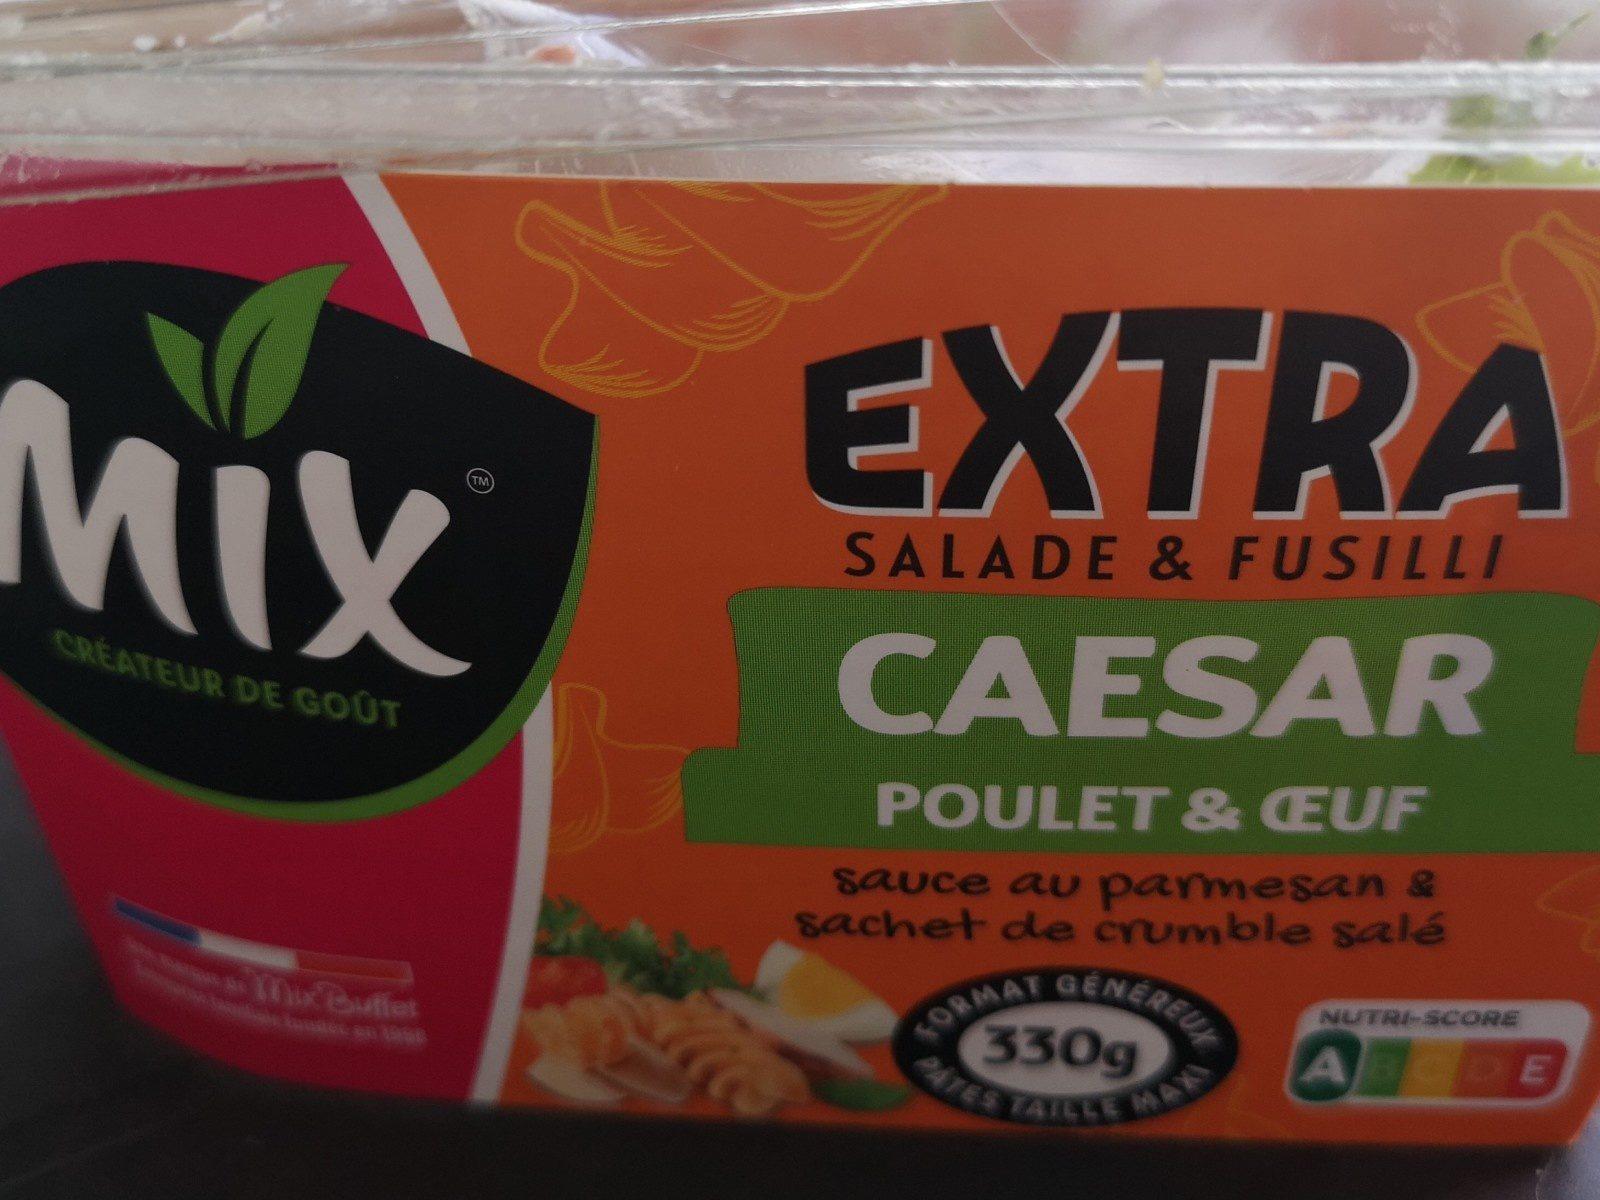 EXTRA Salade & Fusilli Caesar Poulet et Oeuf, 330g - Ingredients - fr